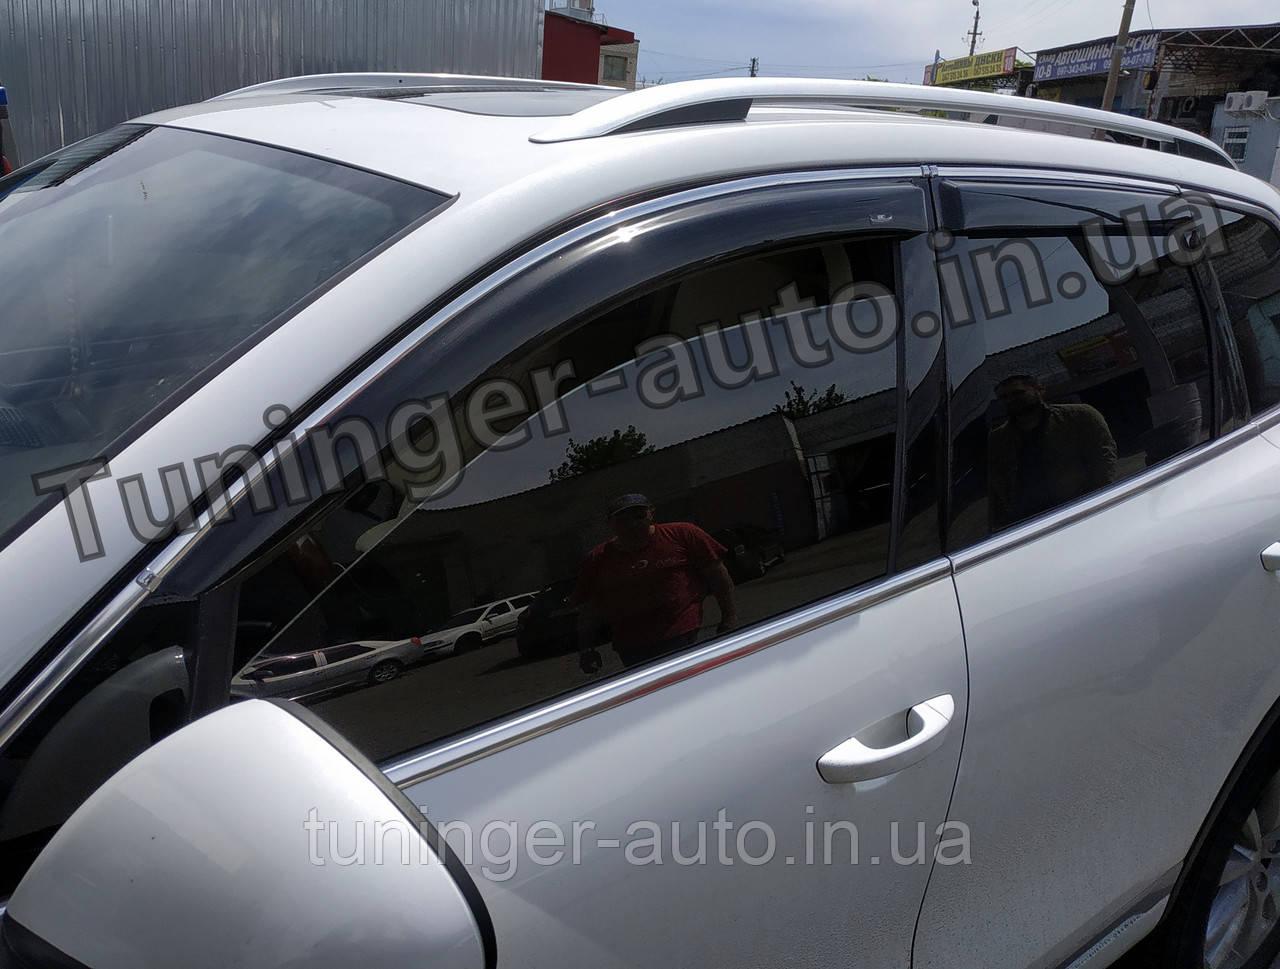 Ветровики с хром молдингом, дефлекторы окон Volkswagen Touareg 2011-2018 (Hic)